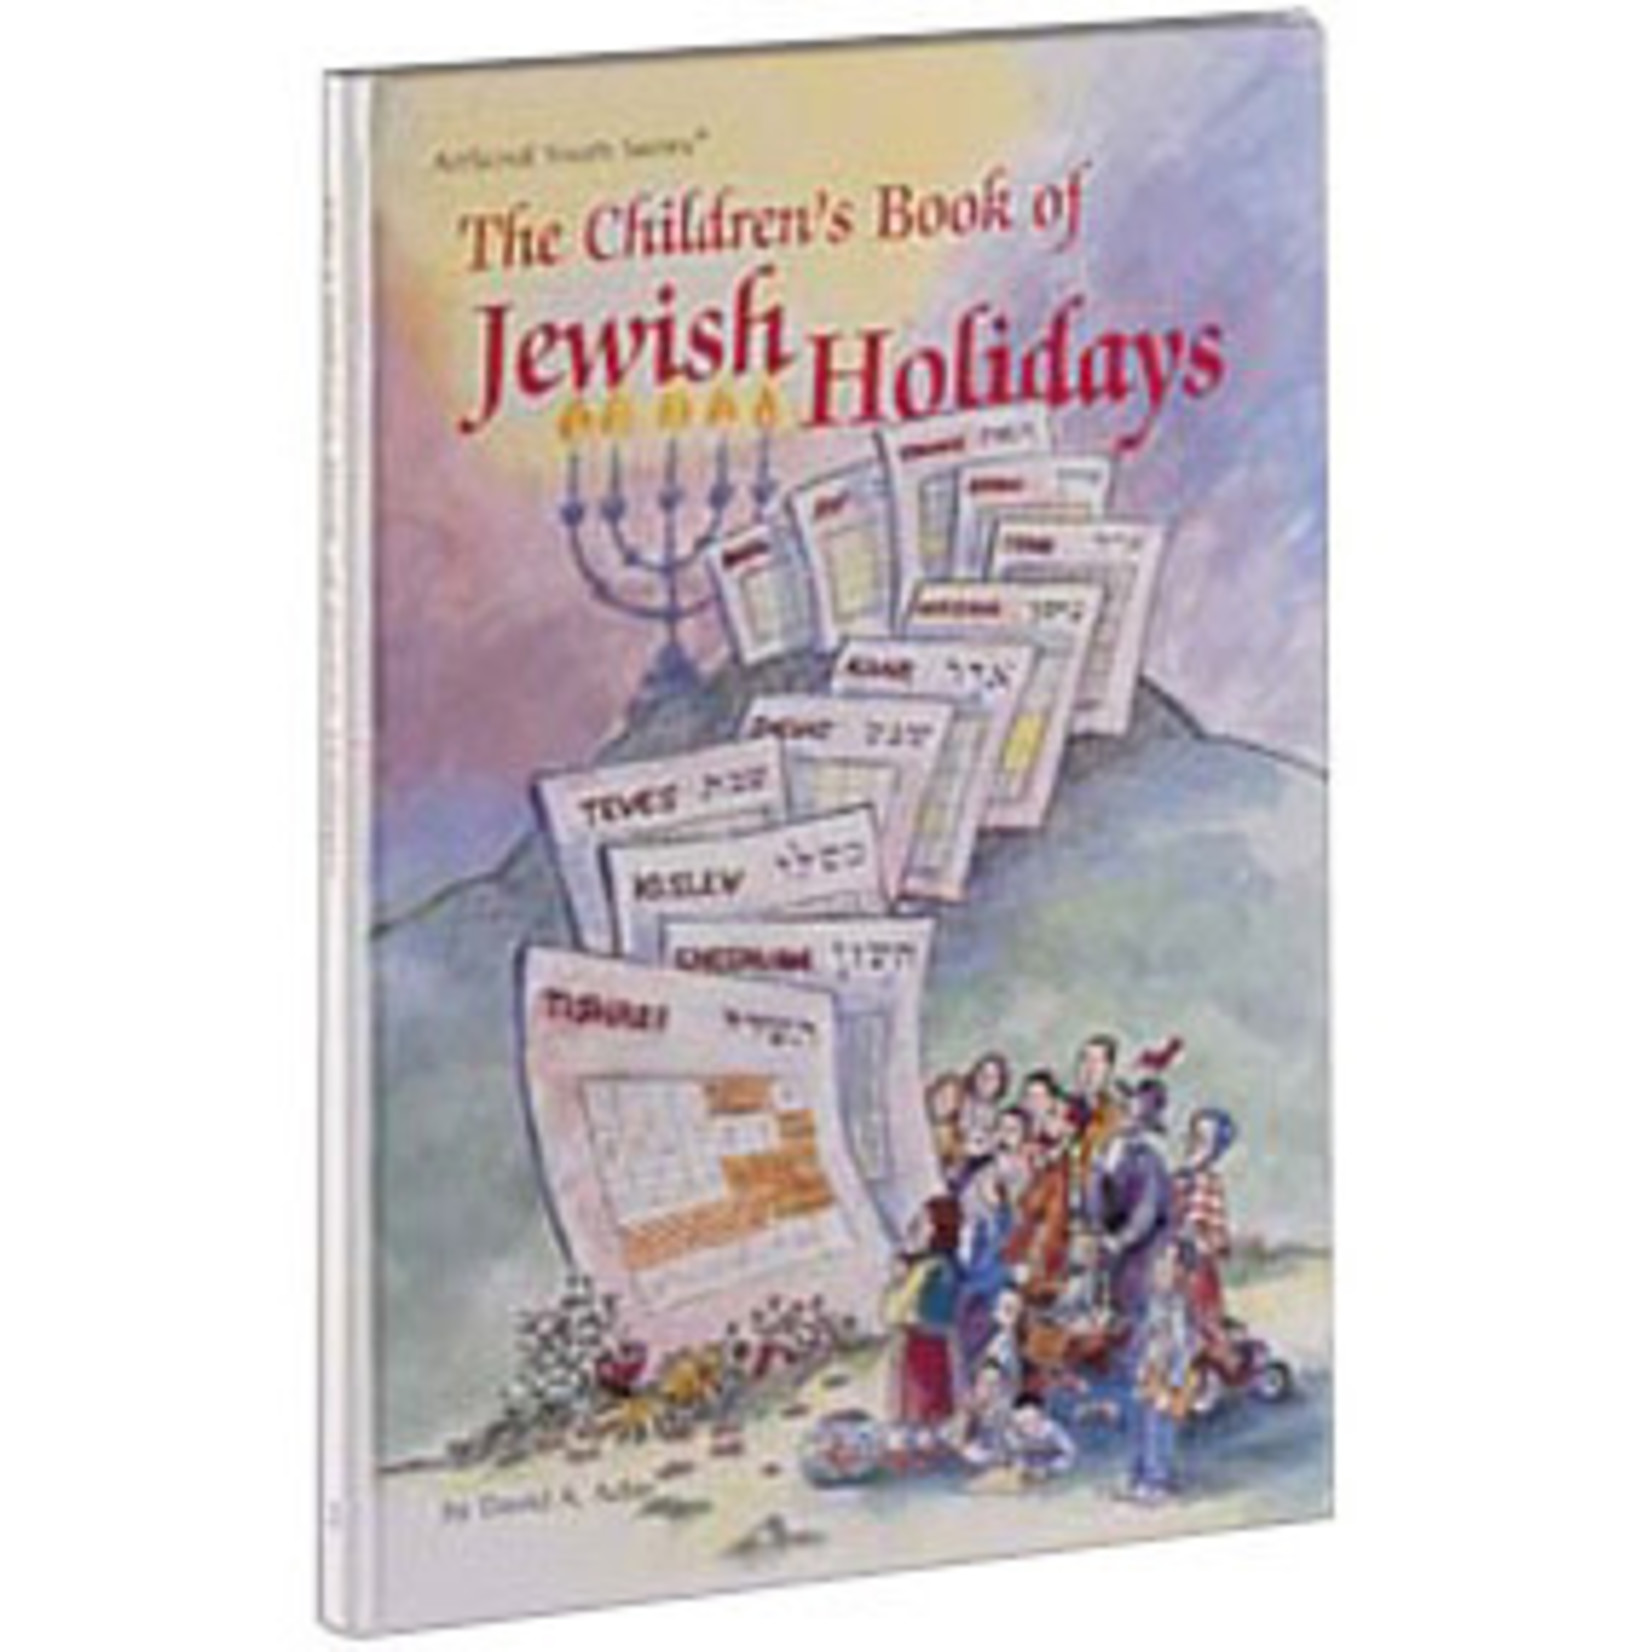 ArtScroll's Children's Book of Jewish Holidays